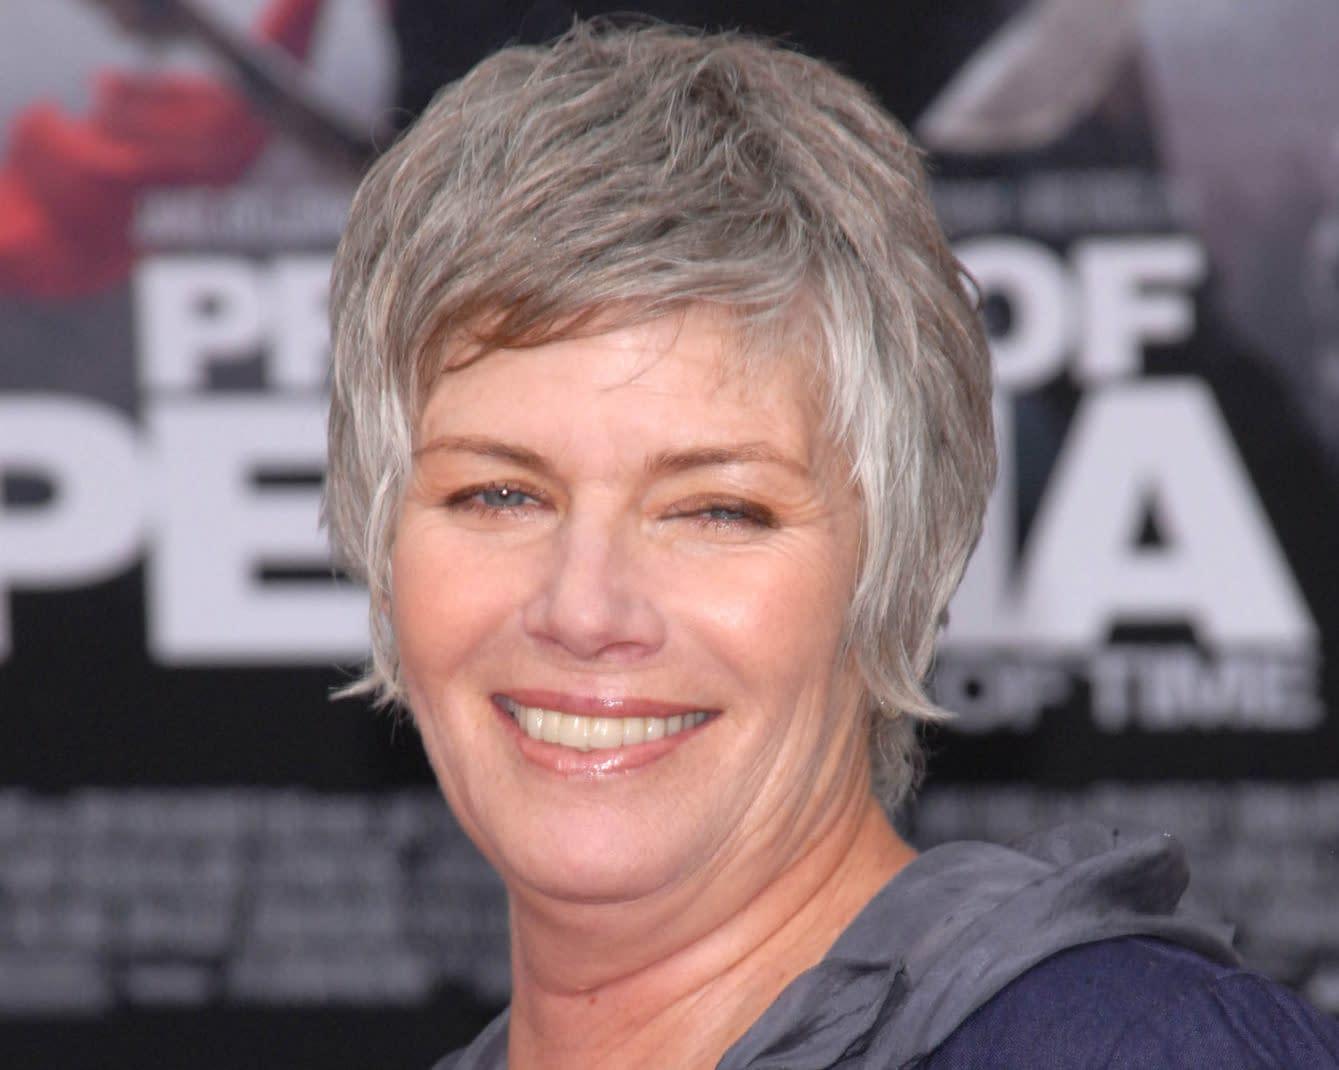 """Top Gun: Maverick"": Kelly McGillis Says Shes Wasn't Asked to Return"